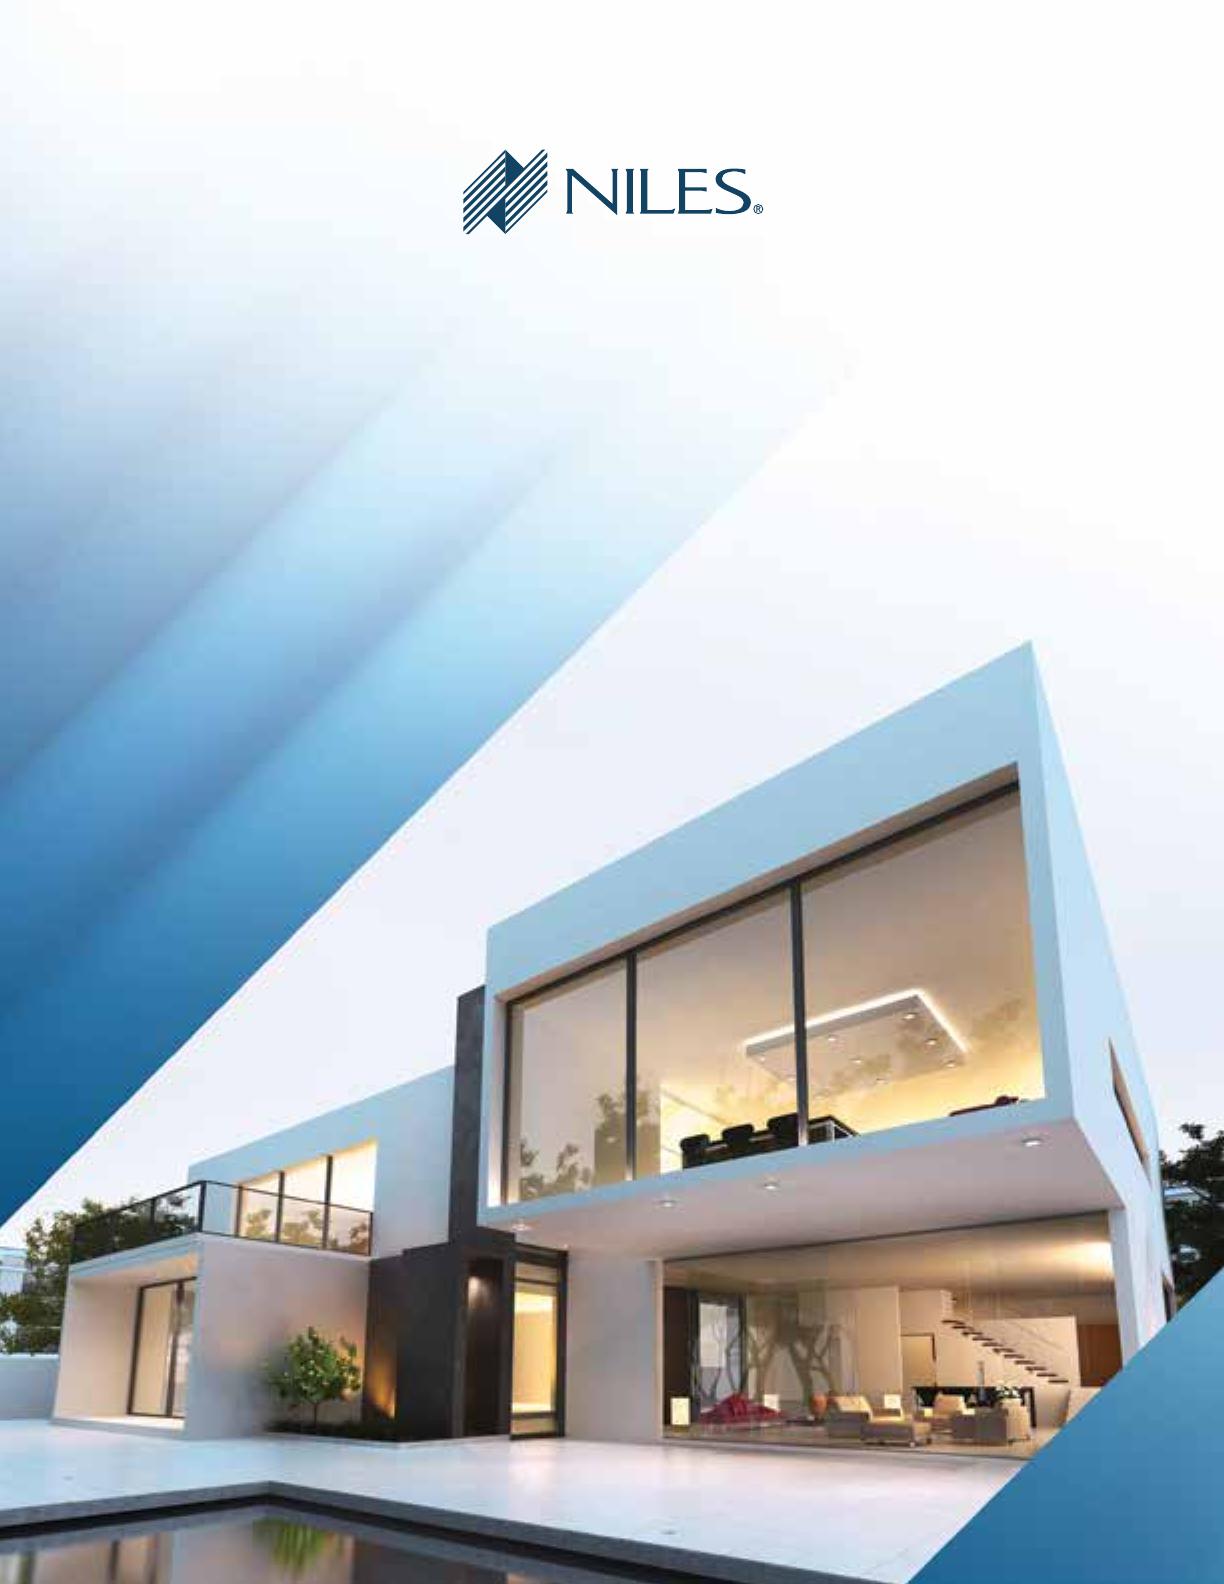 Pdf Niles Catalog on